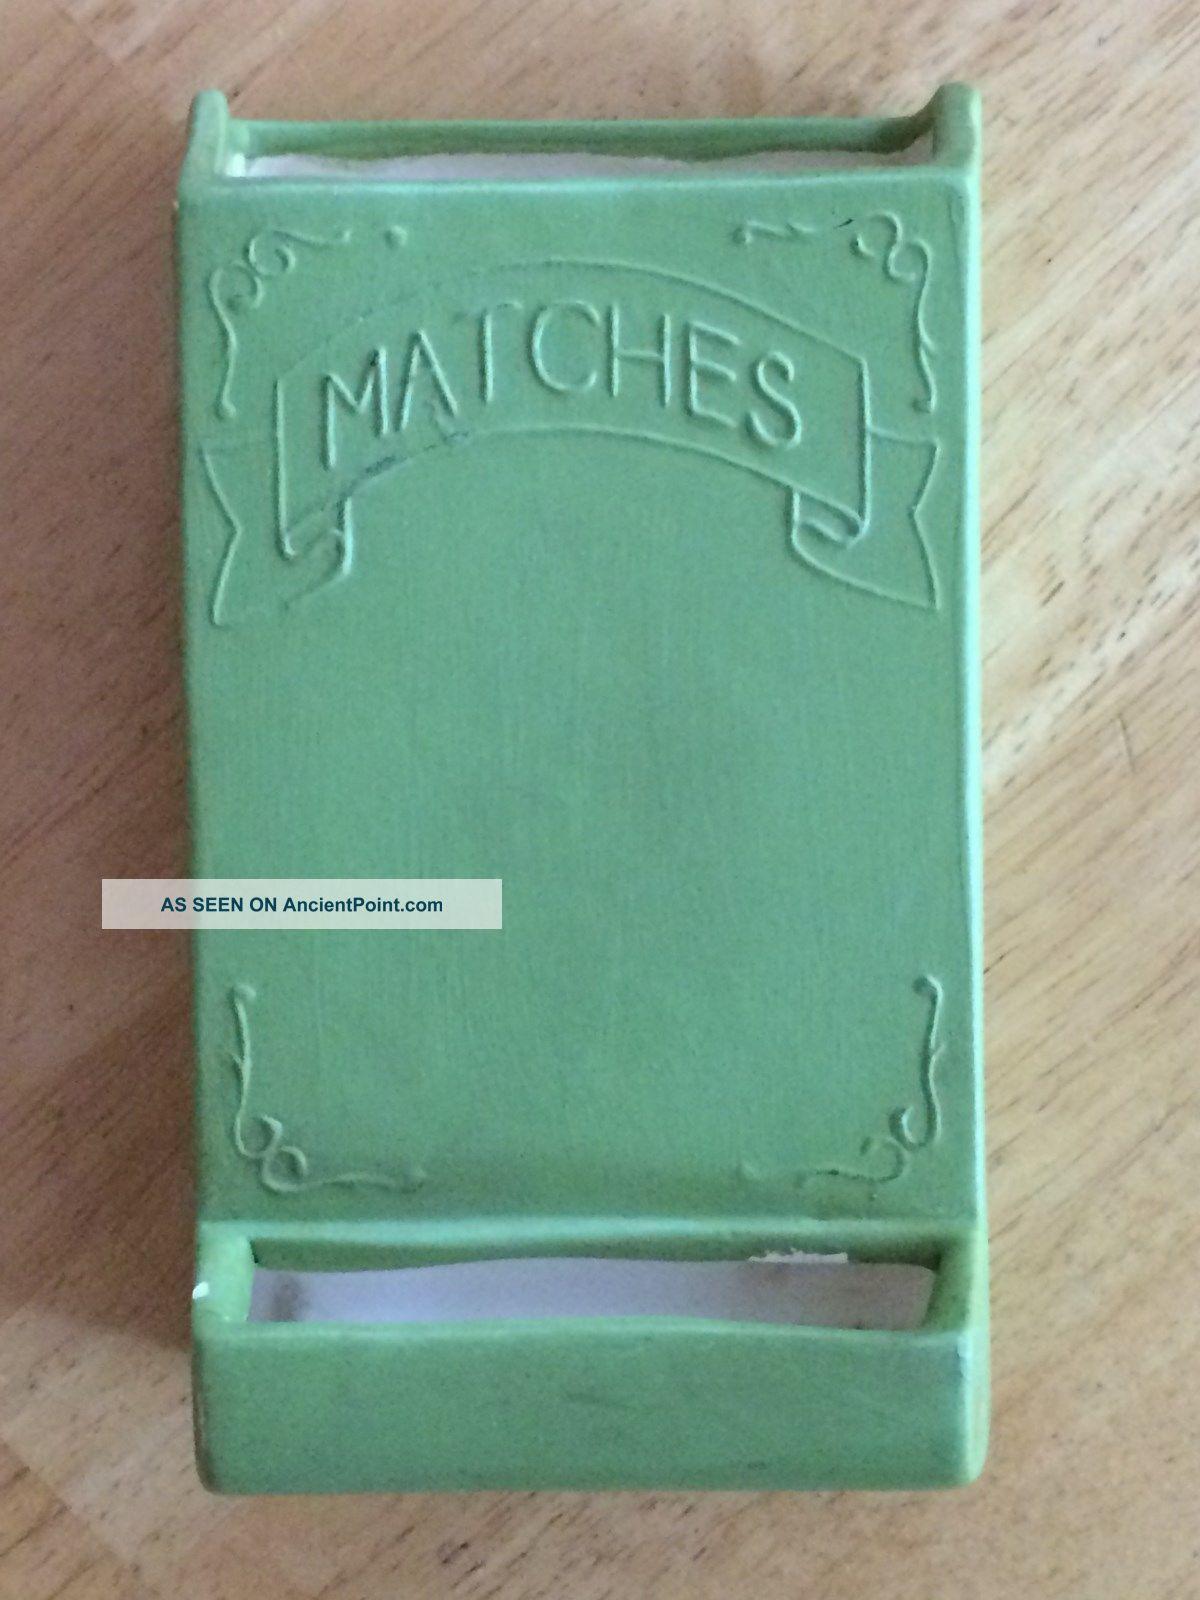 Vintage 1974 Ceramic Fireplace Match Holder - Green,  Cottage Chic,  Sierra Hearth Ware photo